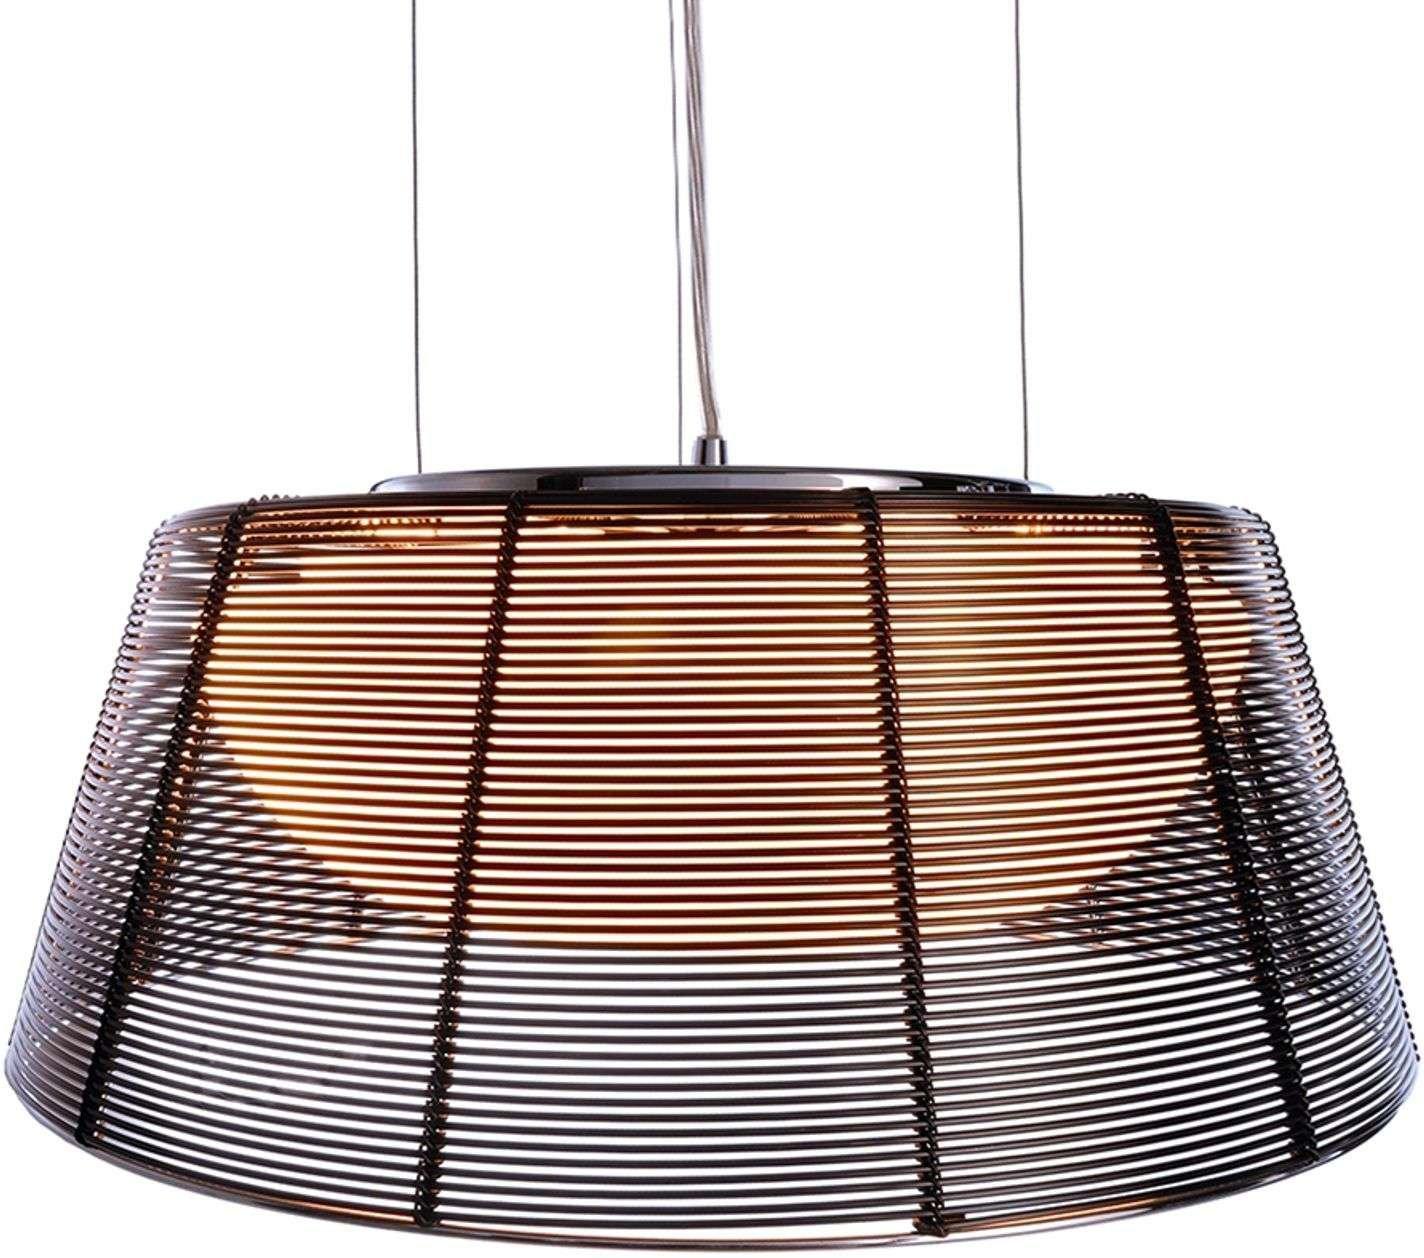 Filo Sat hanging lamp in black